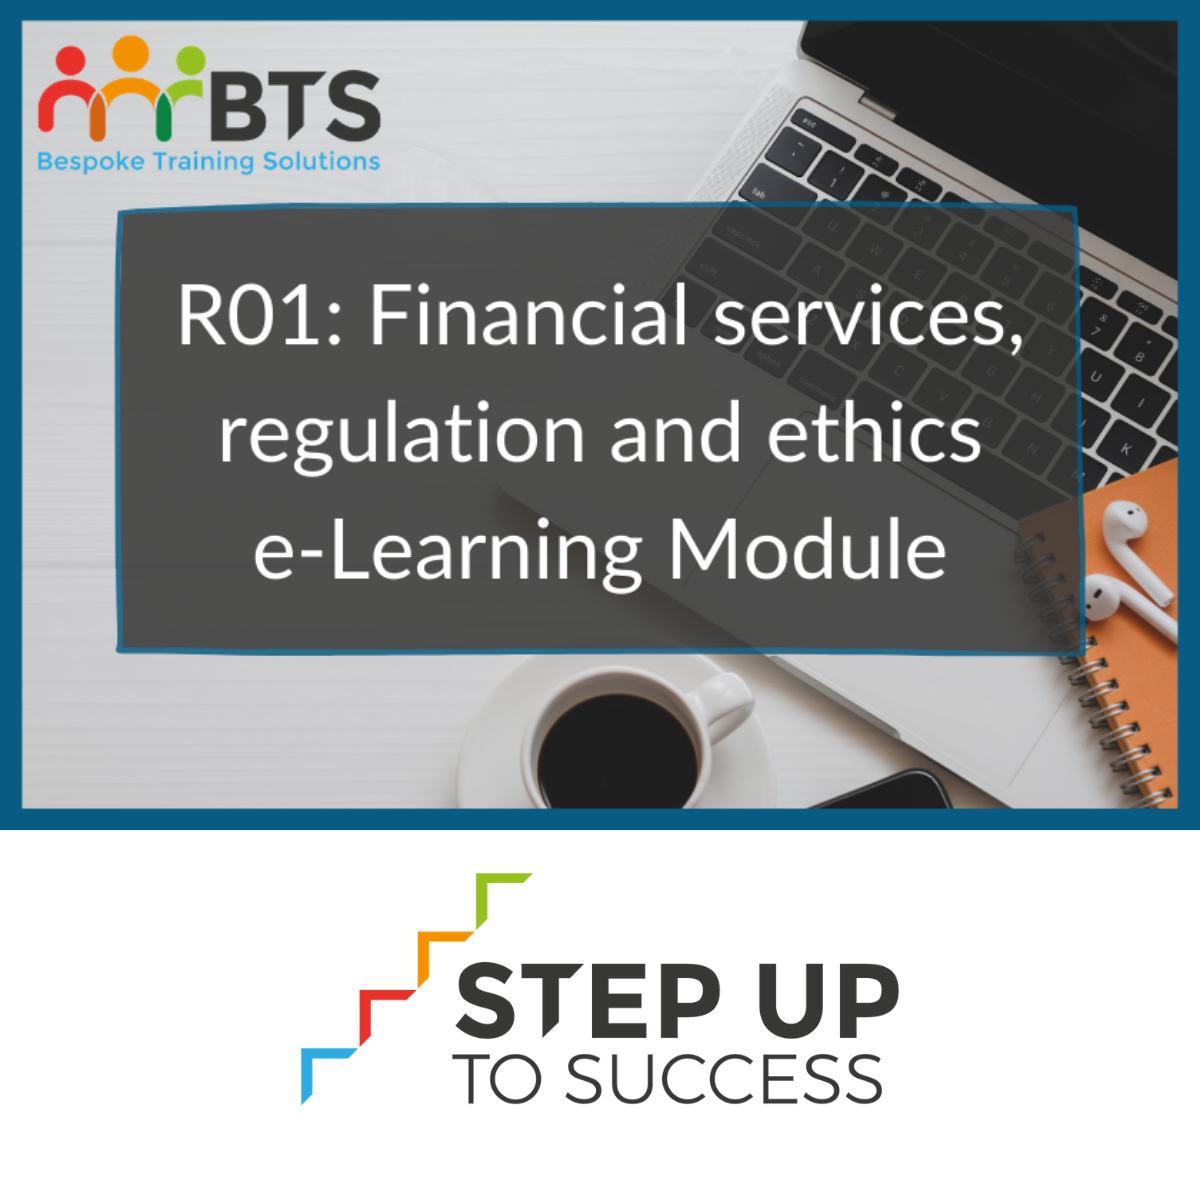 R01 e-Learning